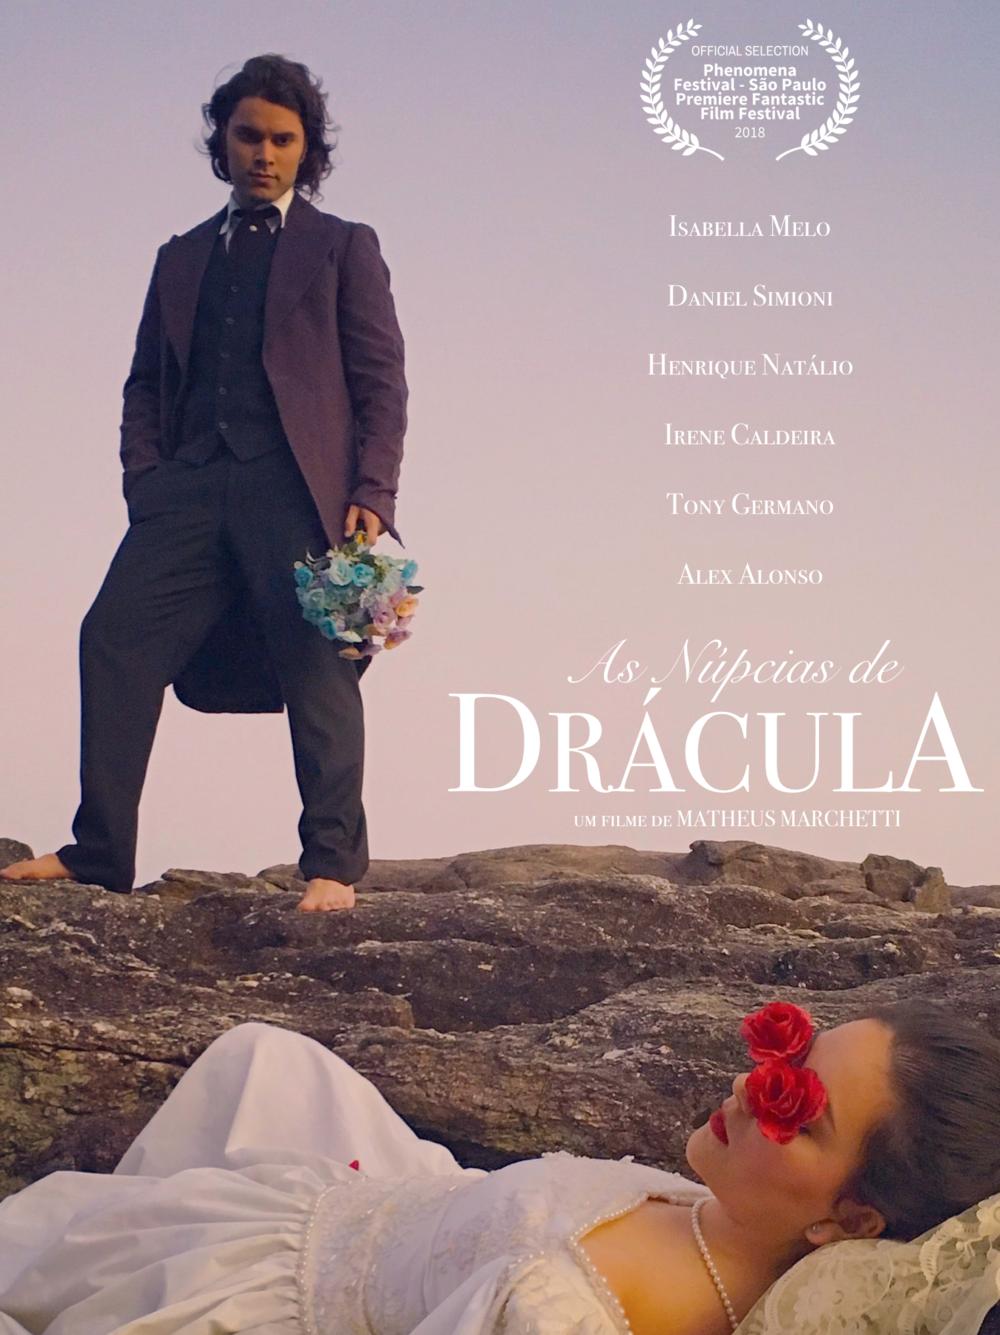 As Núpcias de Drácula.png